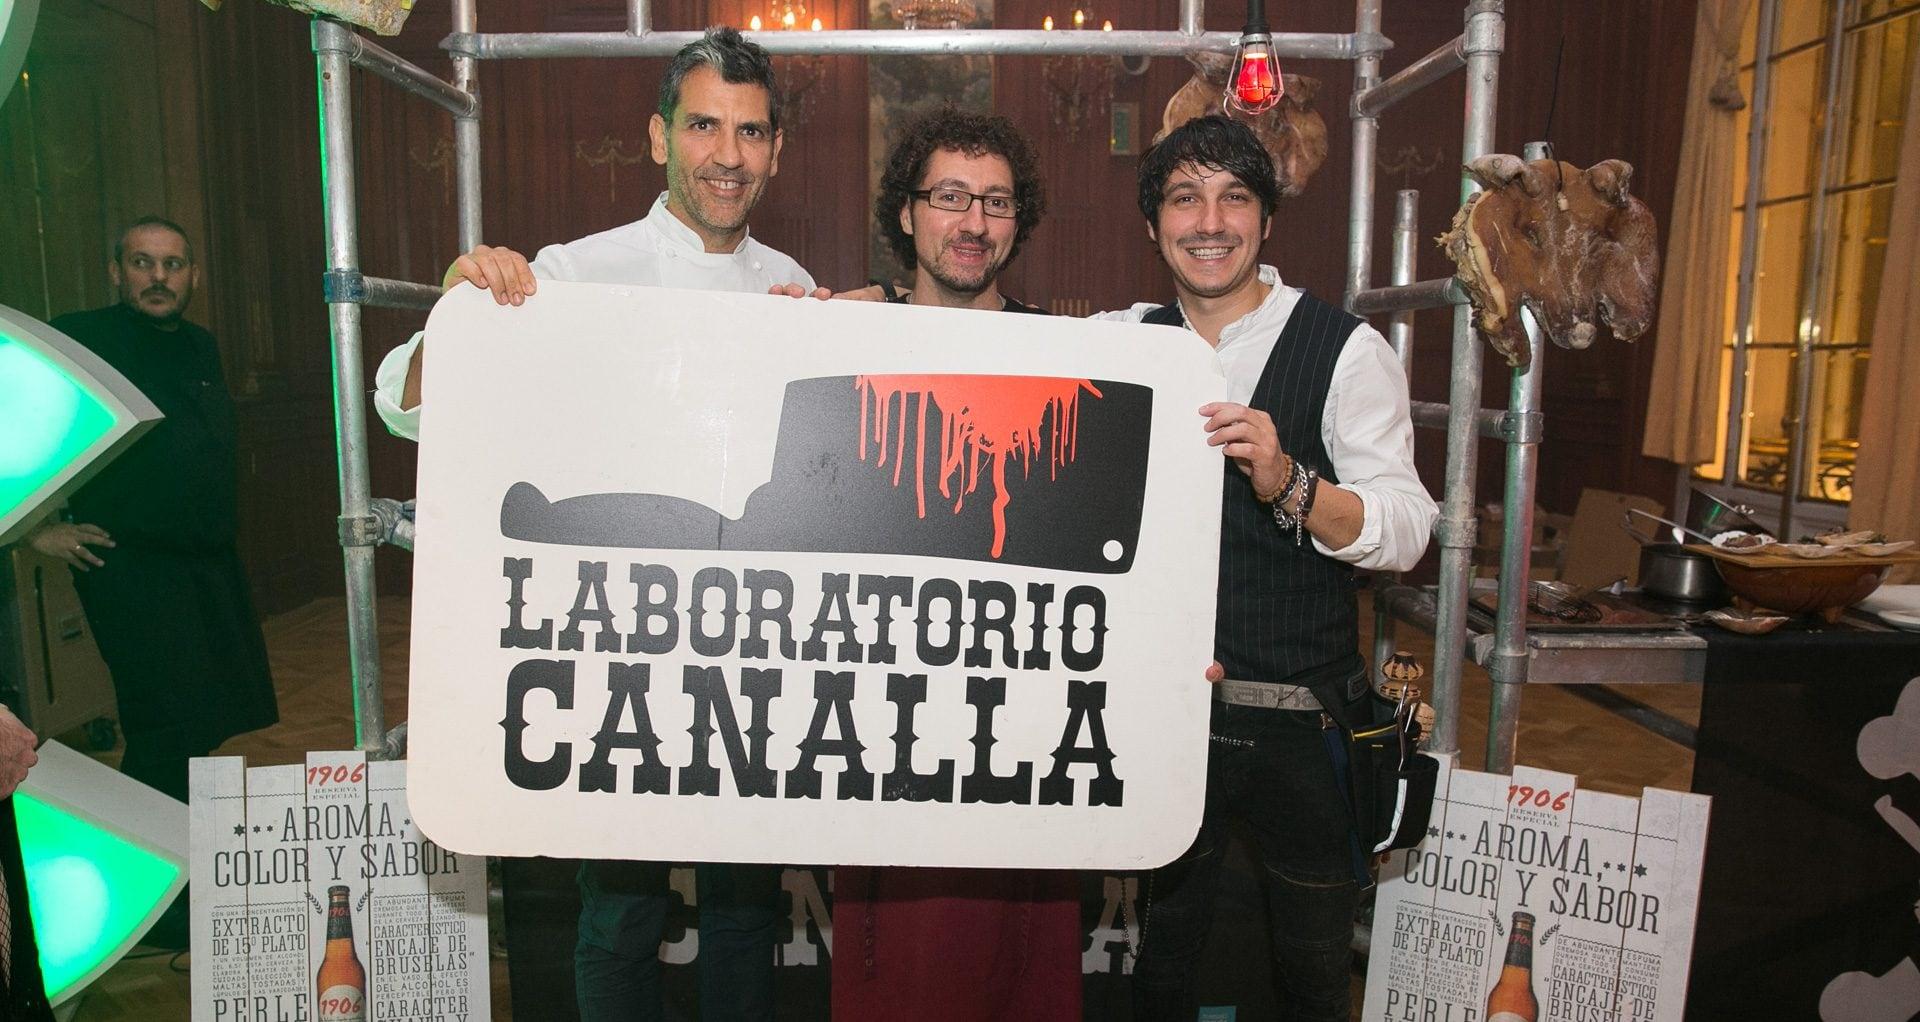 El 'Laboratorio canalla' pone fin a su tour gastronómico